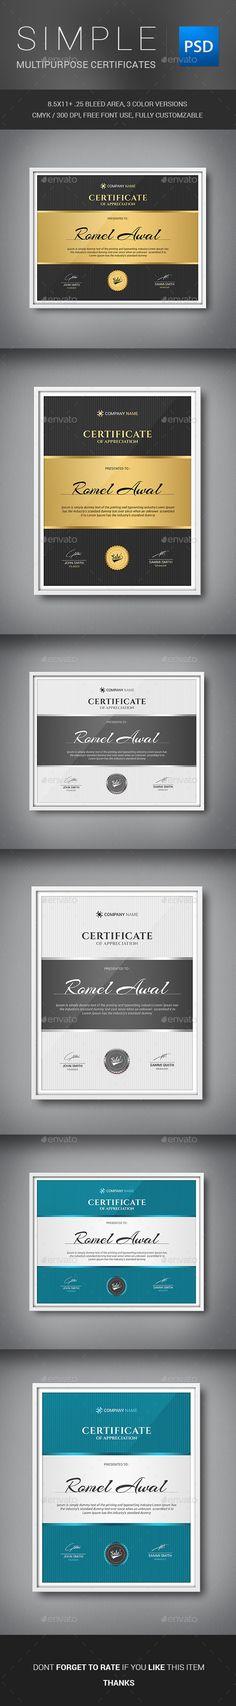 A3 Certificate Template Certificate, Template and Certificate design - corporate certificate template